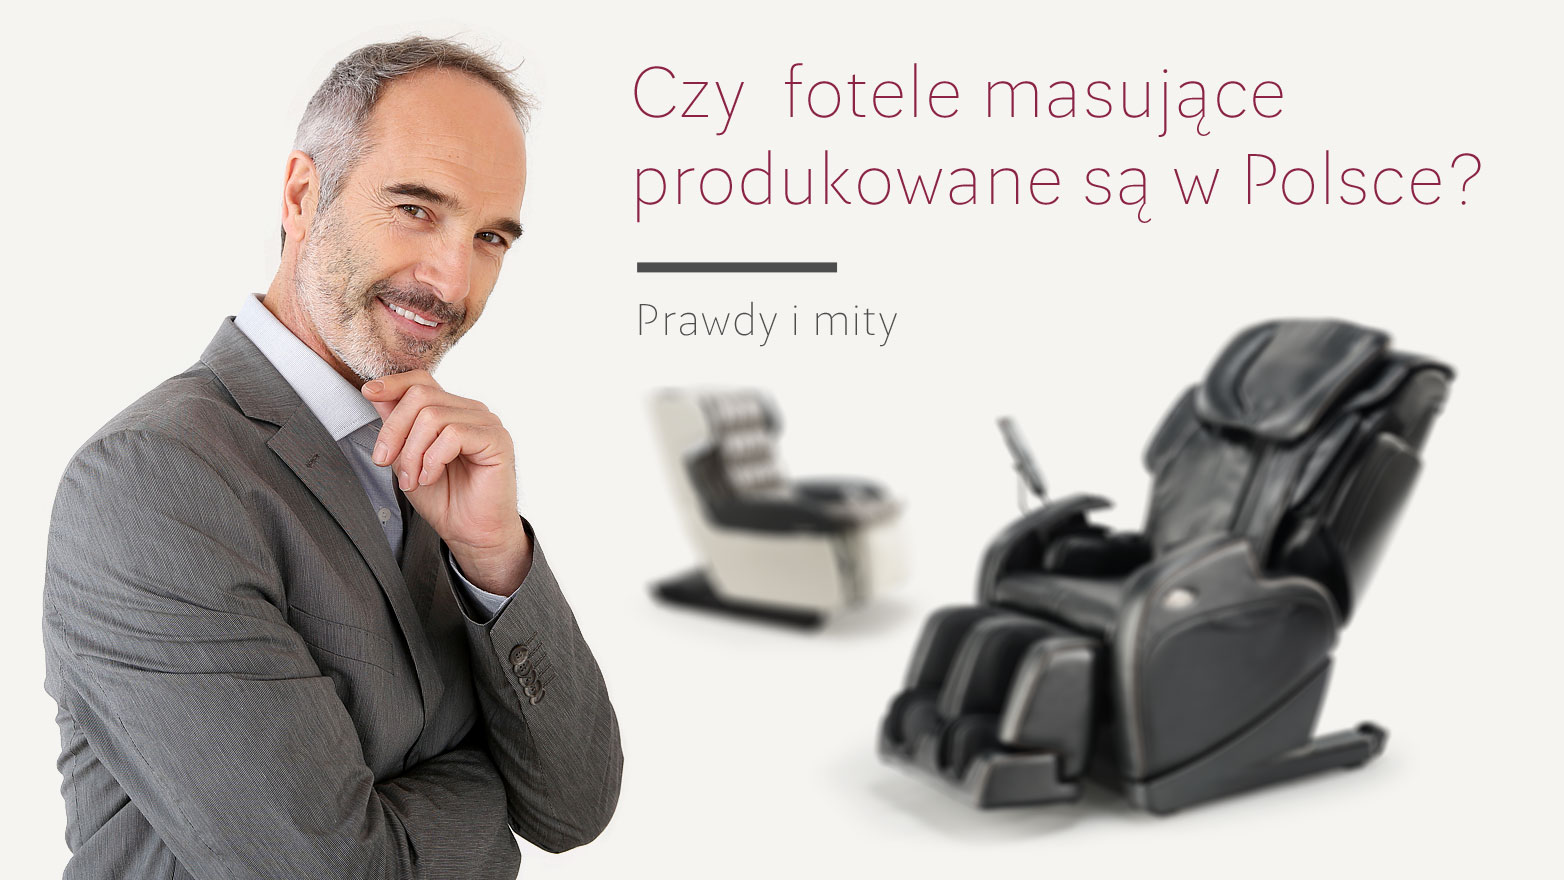 Polskie fotele masujące